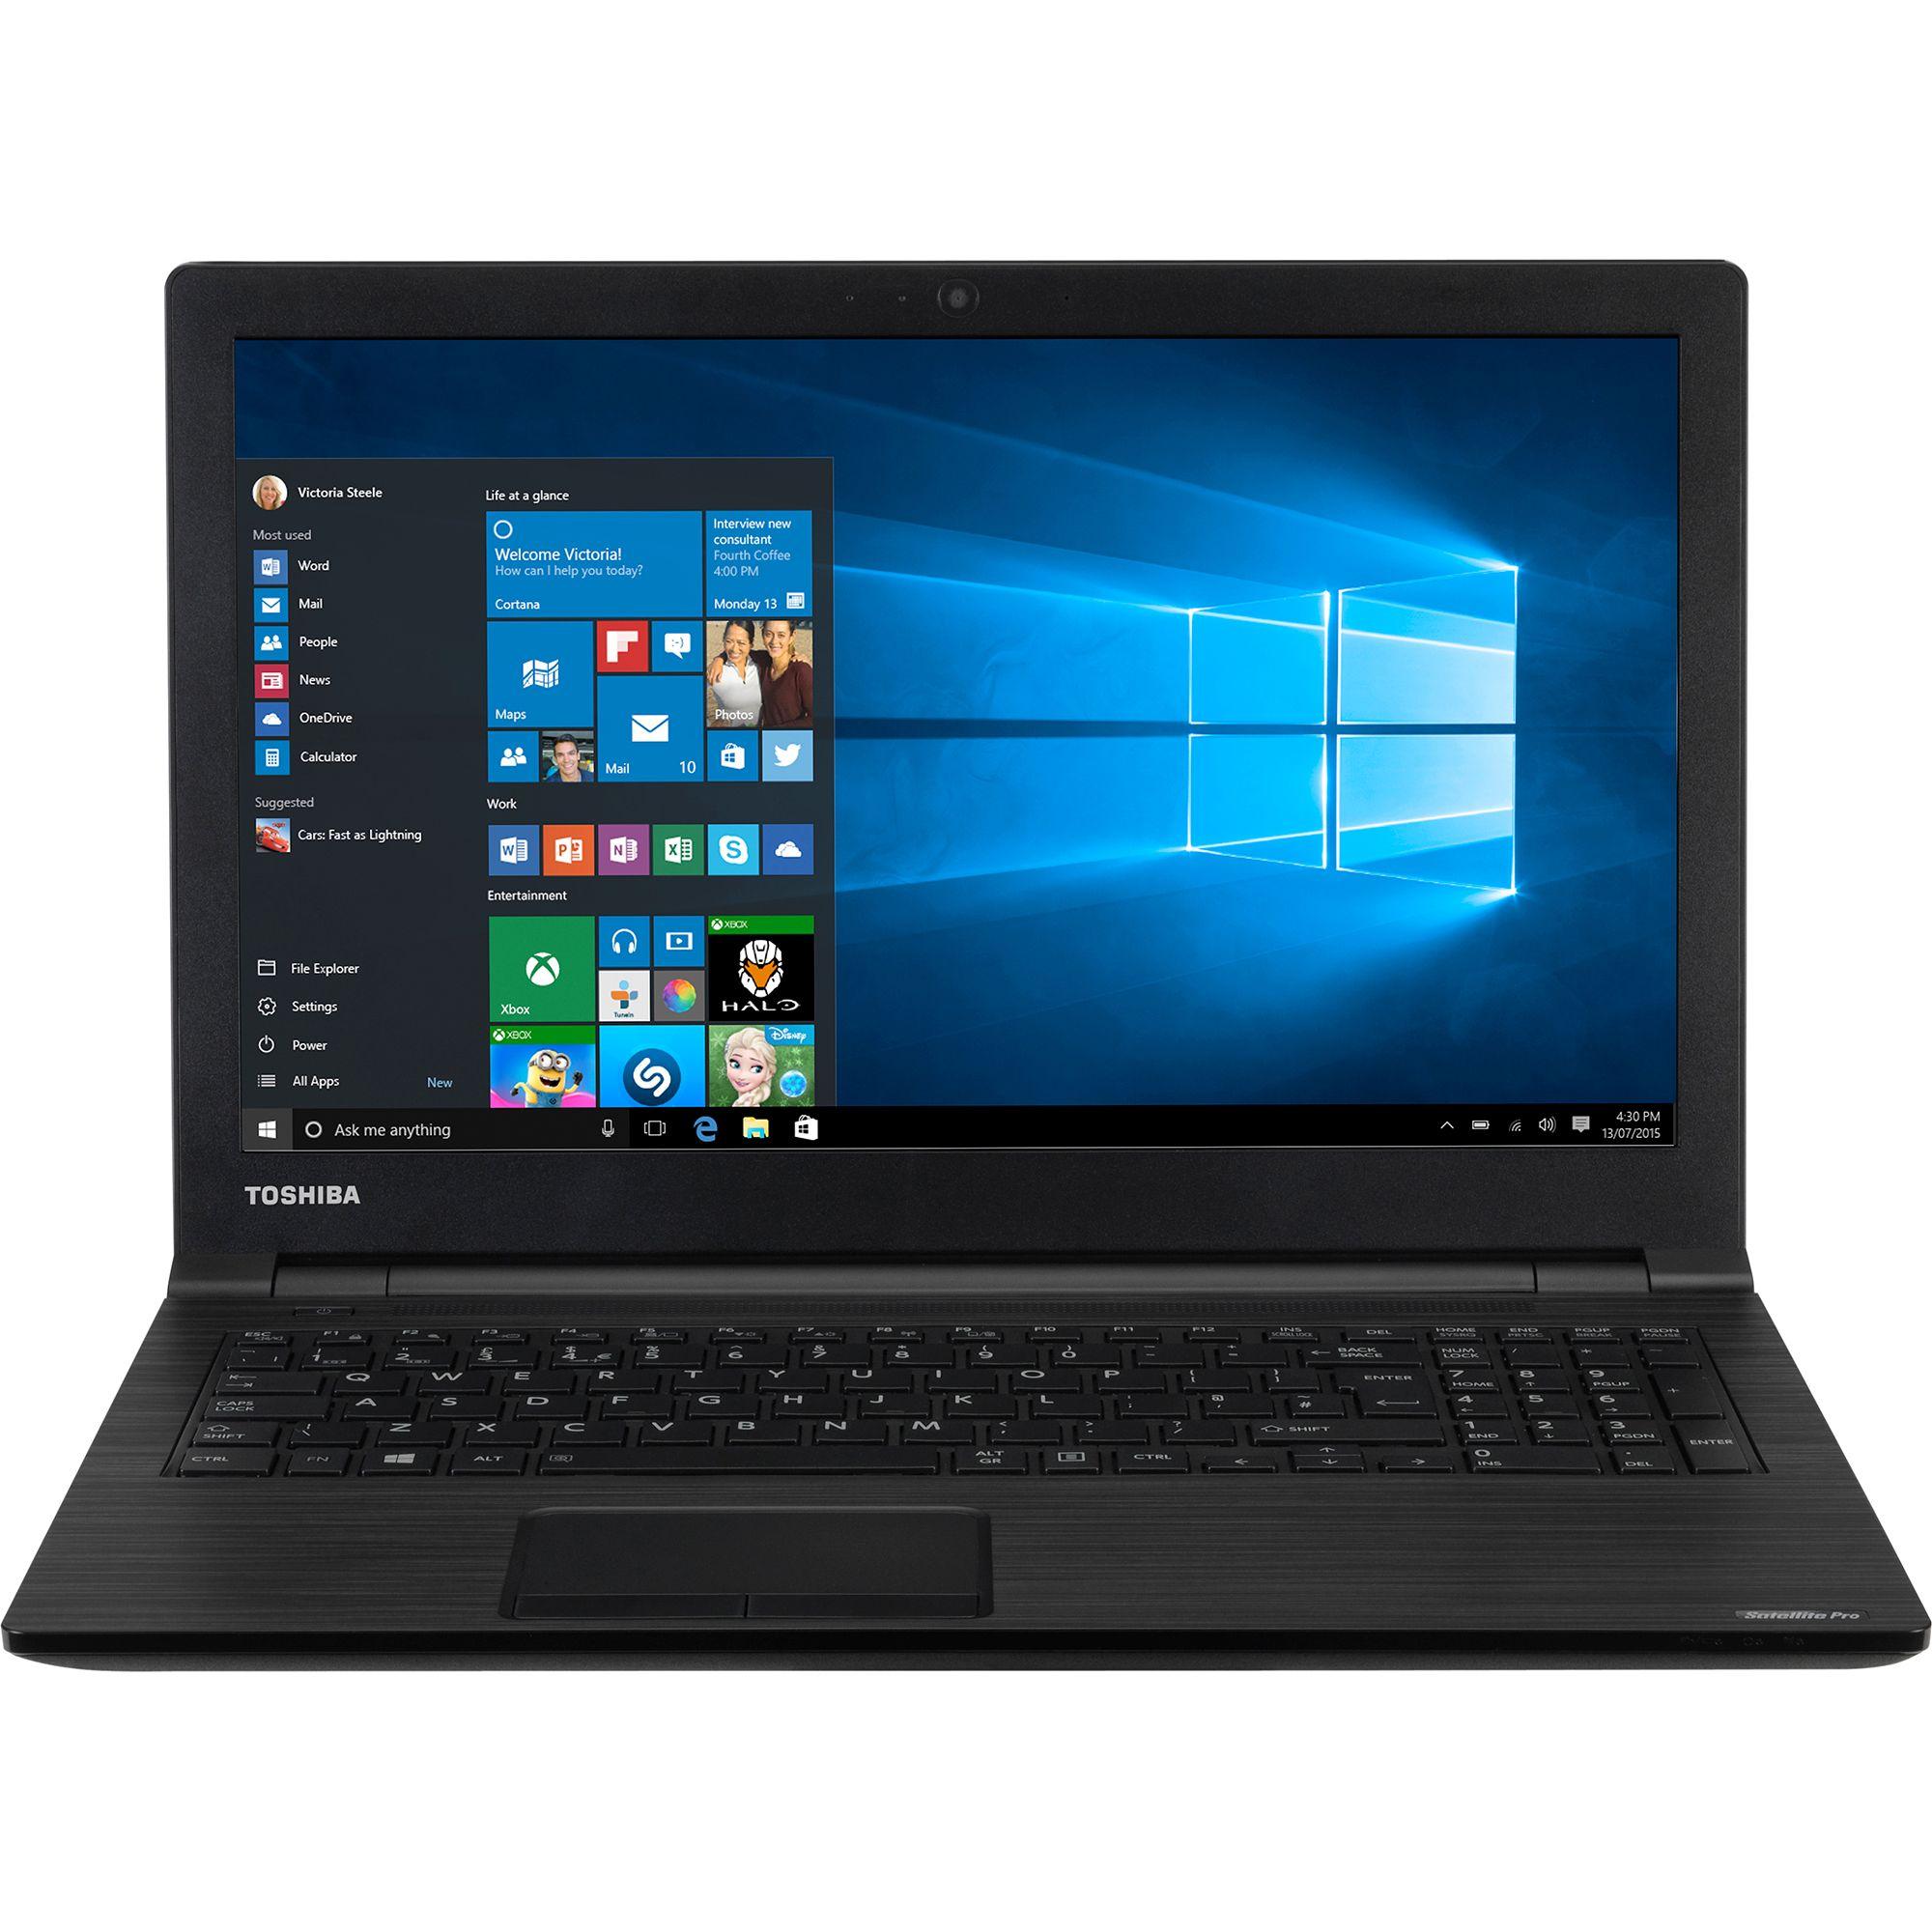 Notebook Toshiba Satellite Pro A50-E-10W 15.6 Full HD Intel Core i7-8550U RAM 8GB SSD 512GB Windows 10 Pro Negru